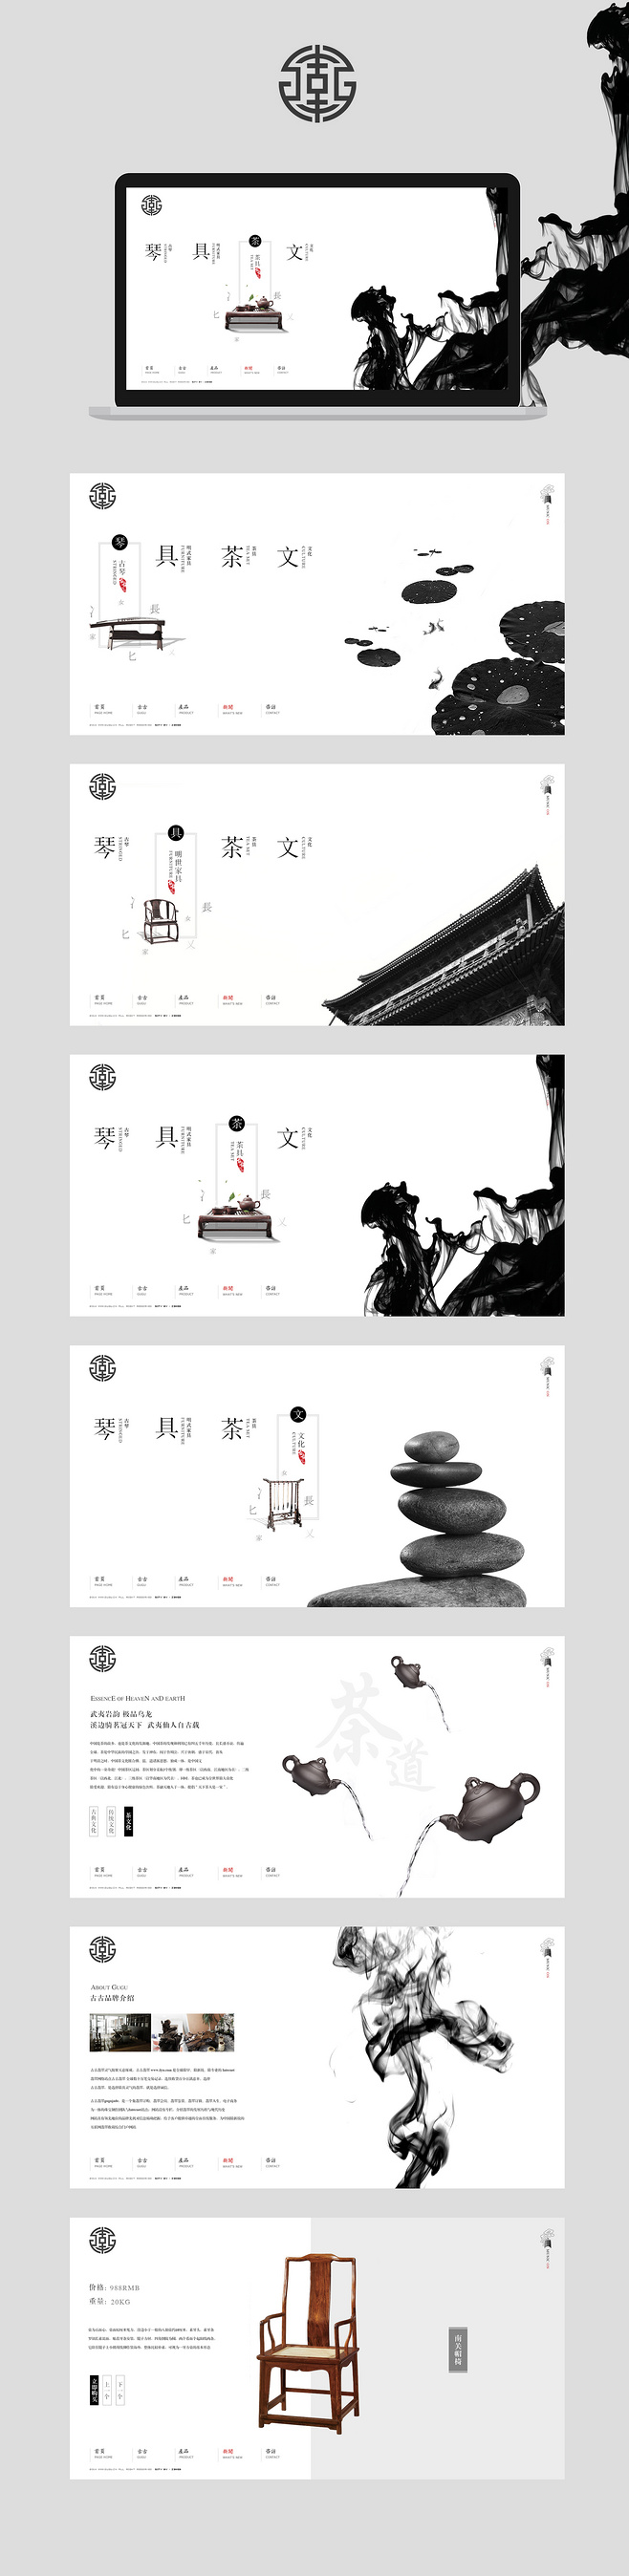 Monochrome high-contrast web design.